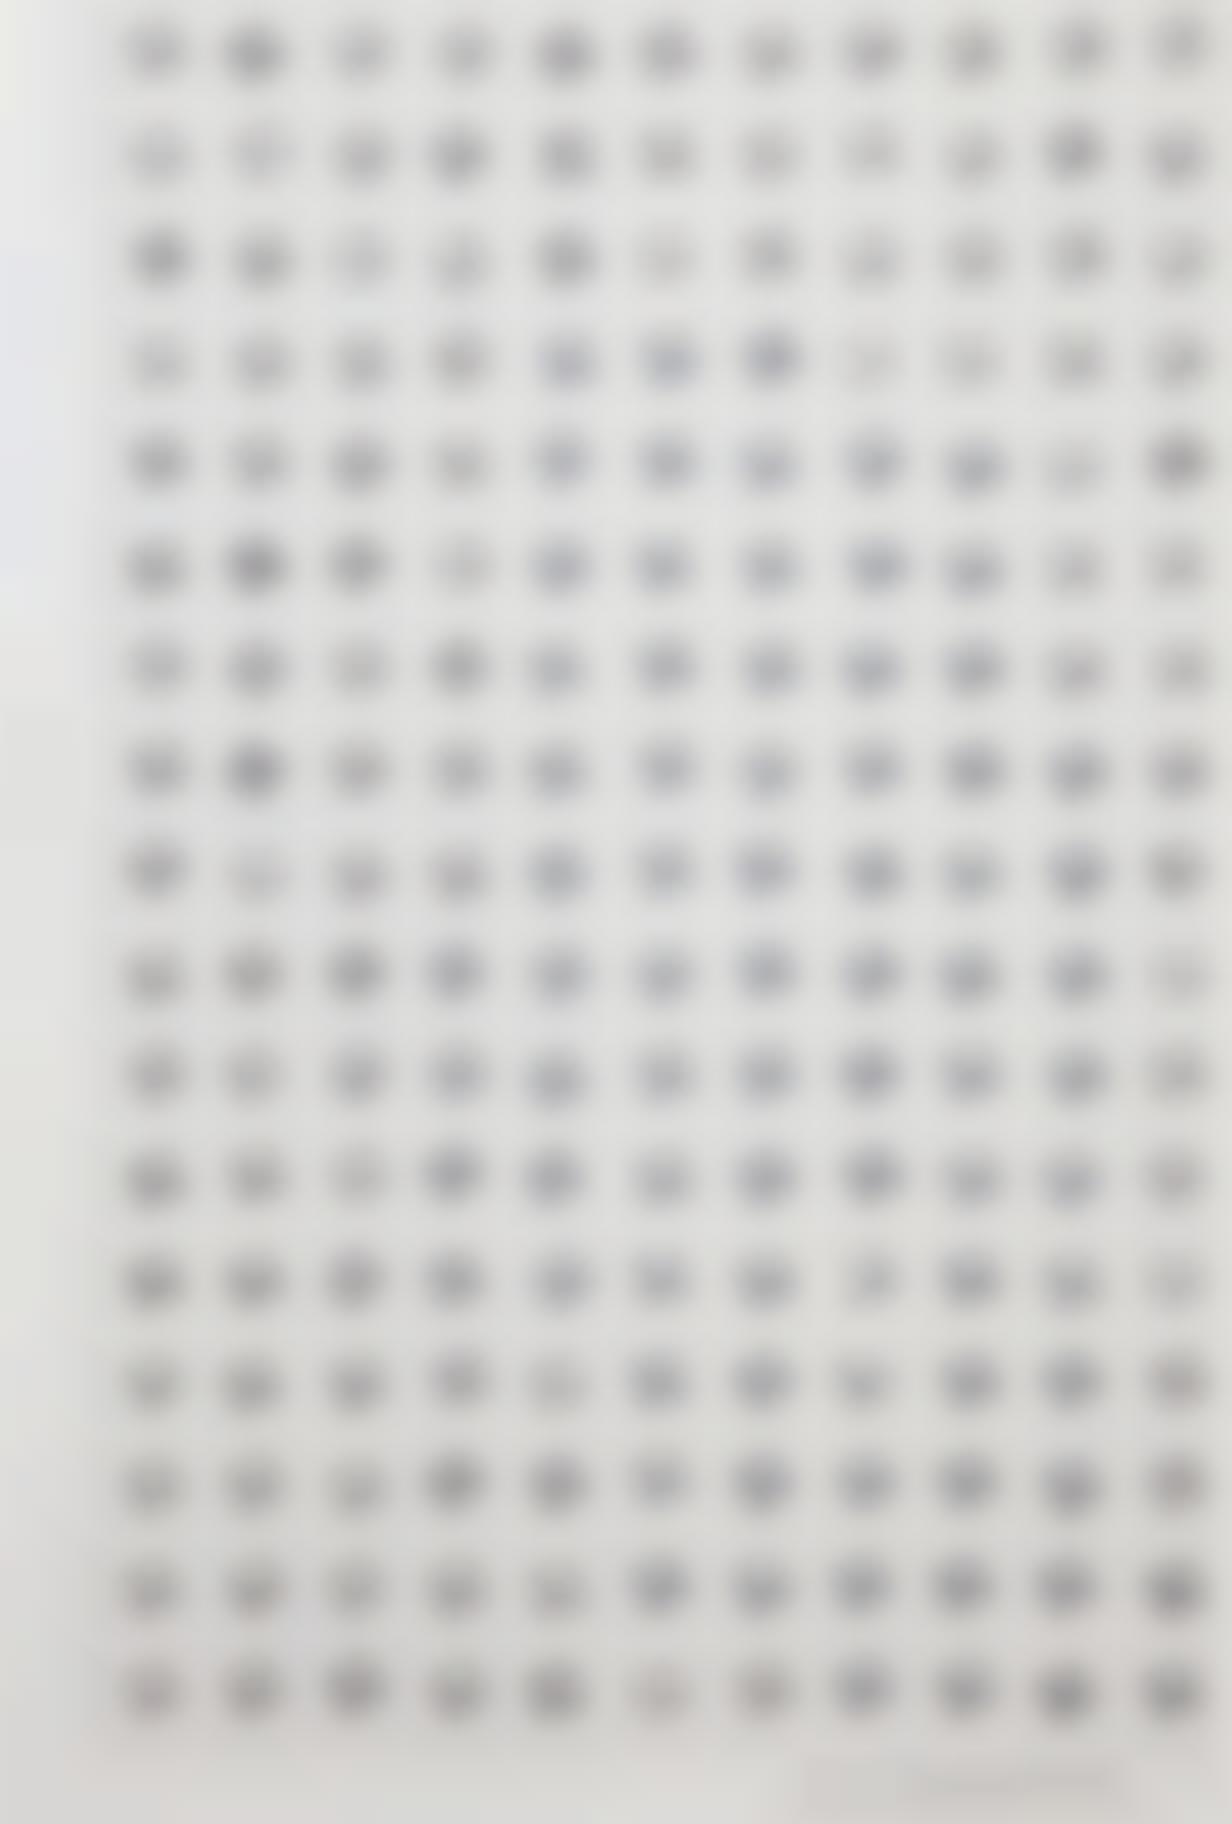 Louis Eisner-Knucklehead 4726152 XXXXXXX XXXXXXX-2013